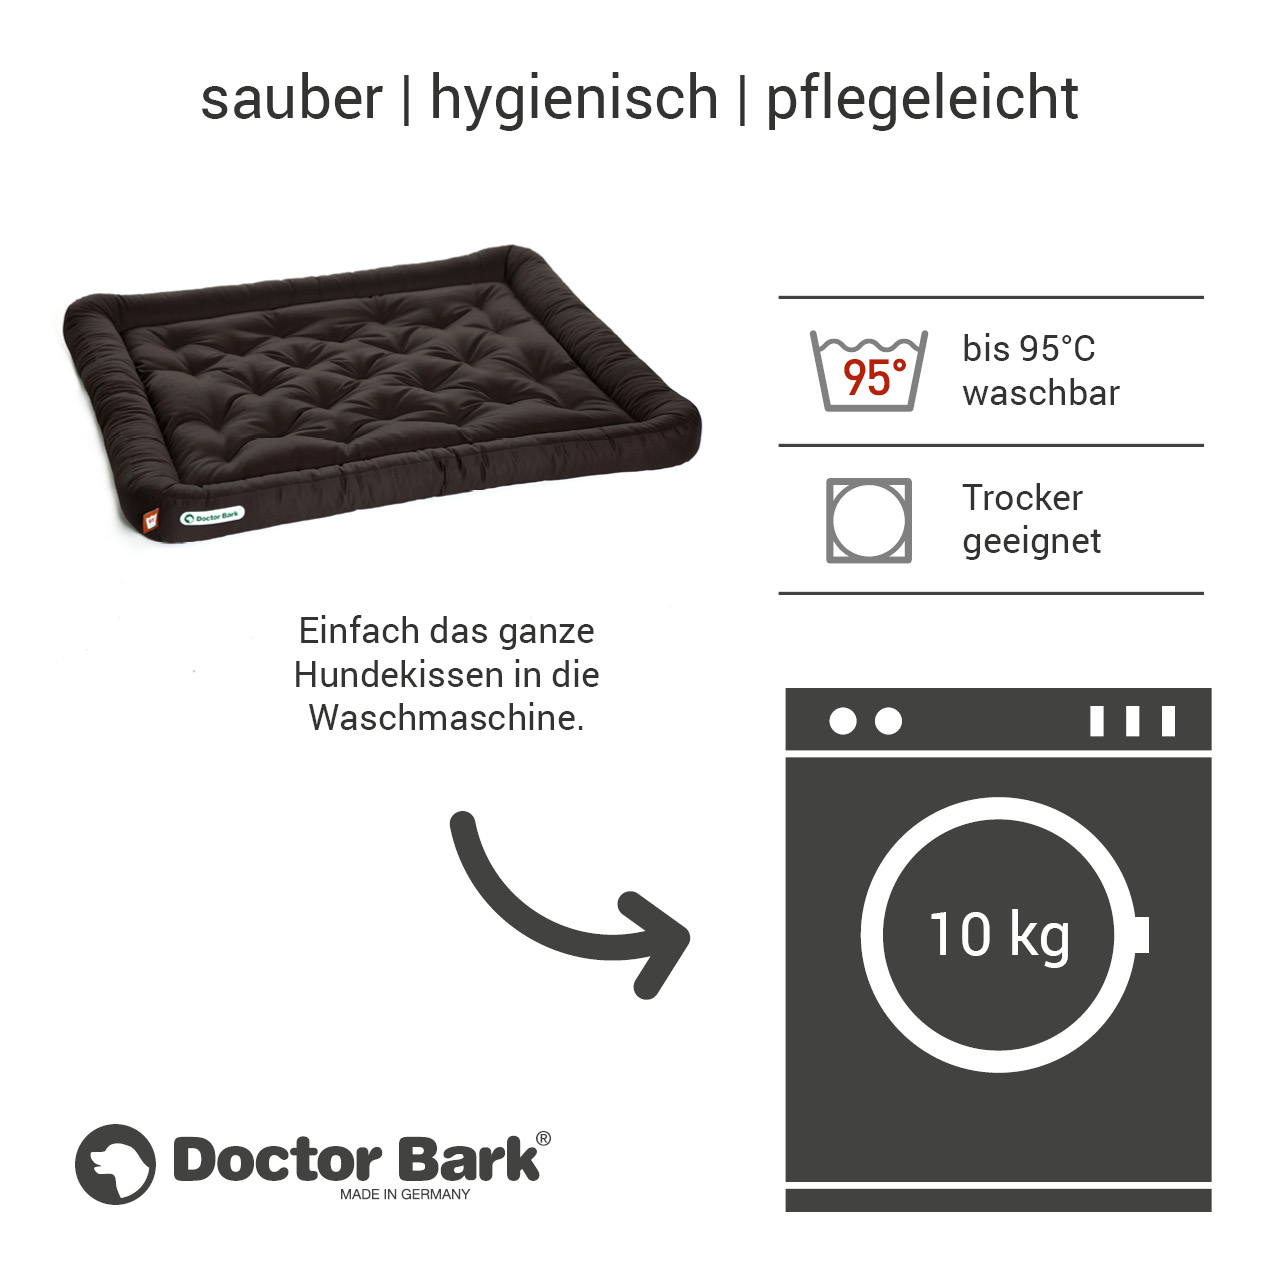 Lounge-Hundekissen / Hundebett orthopädisch Doctor Bark waschbar braun - Gr. XXL